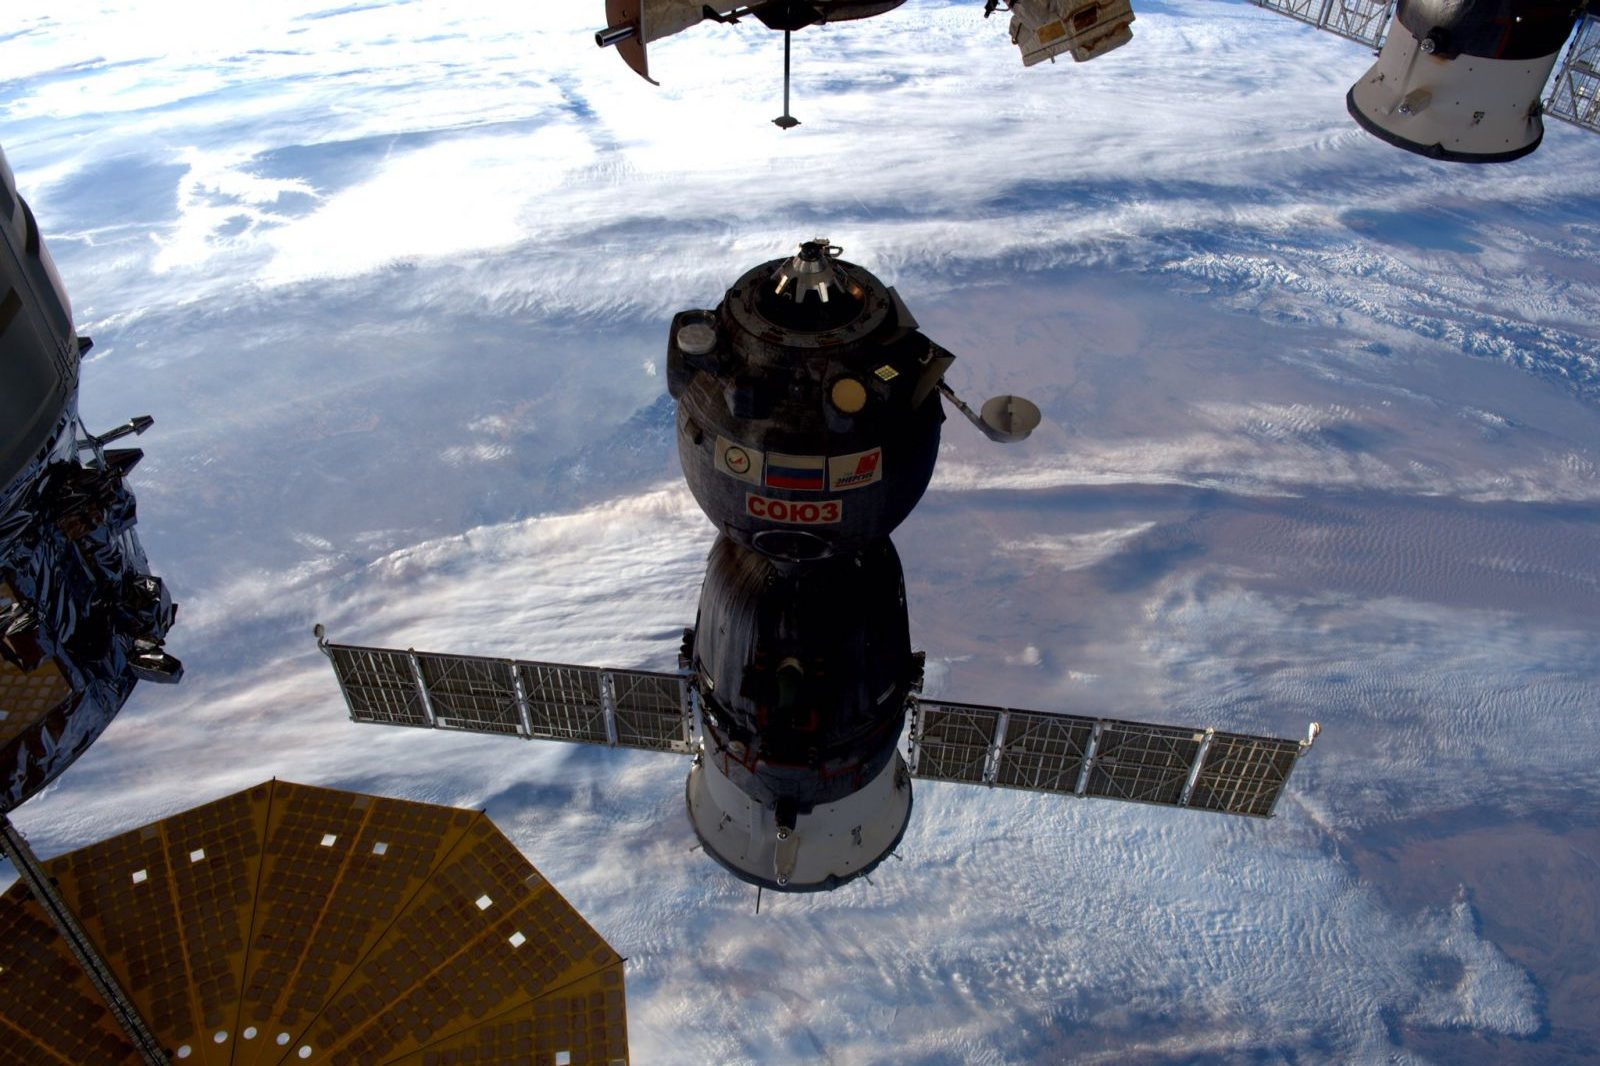 Soyuz MS-02 undocking from ISS. Photo Credit: NASA